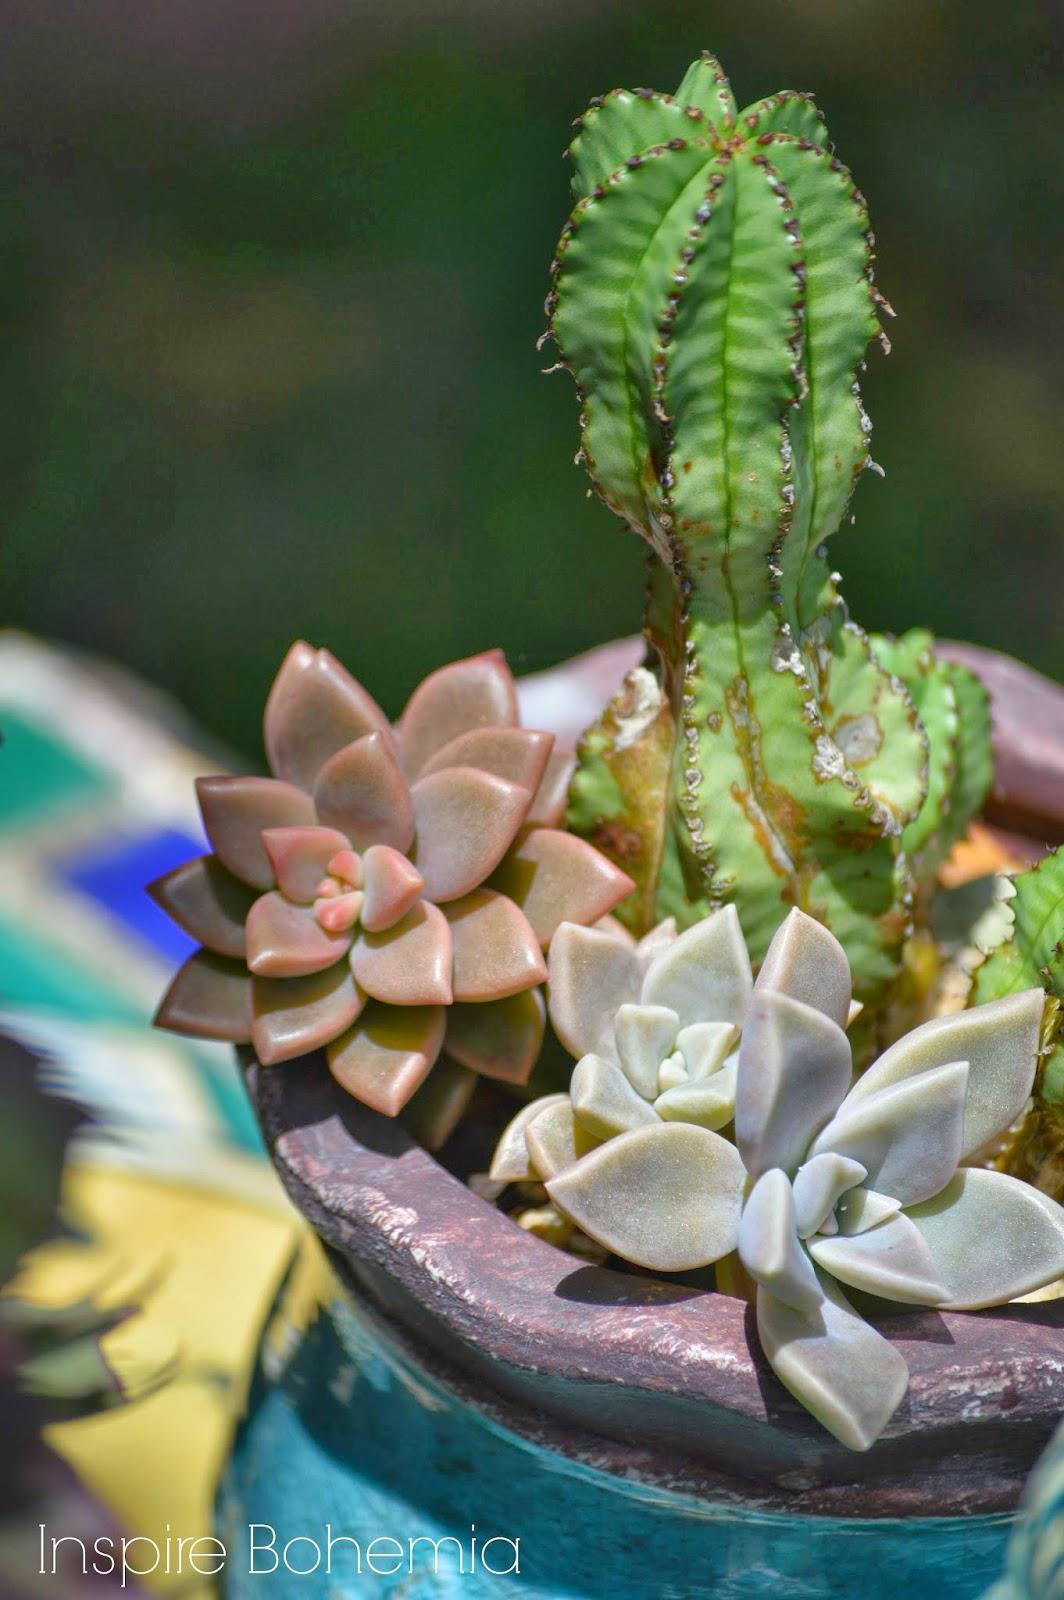 succulents and cacti-gardening-InspireBohemia.com - watermarked-